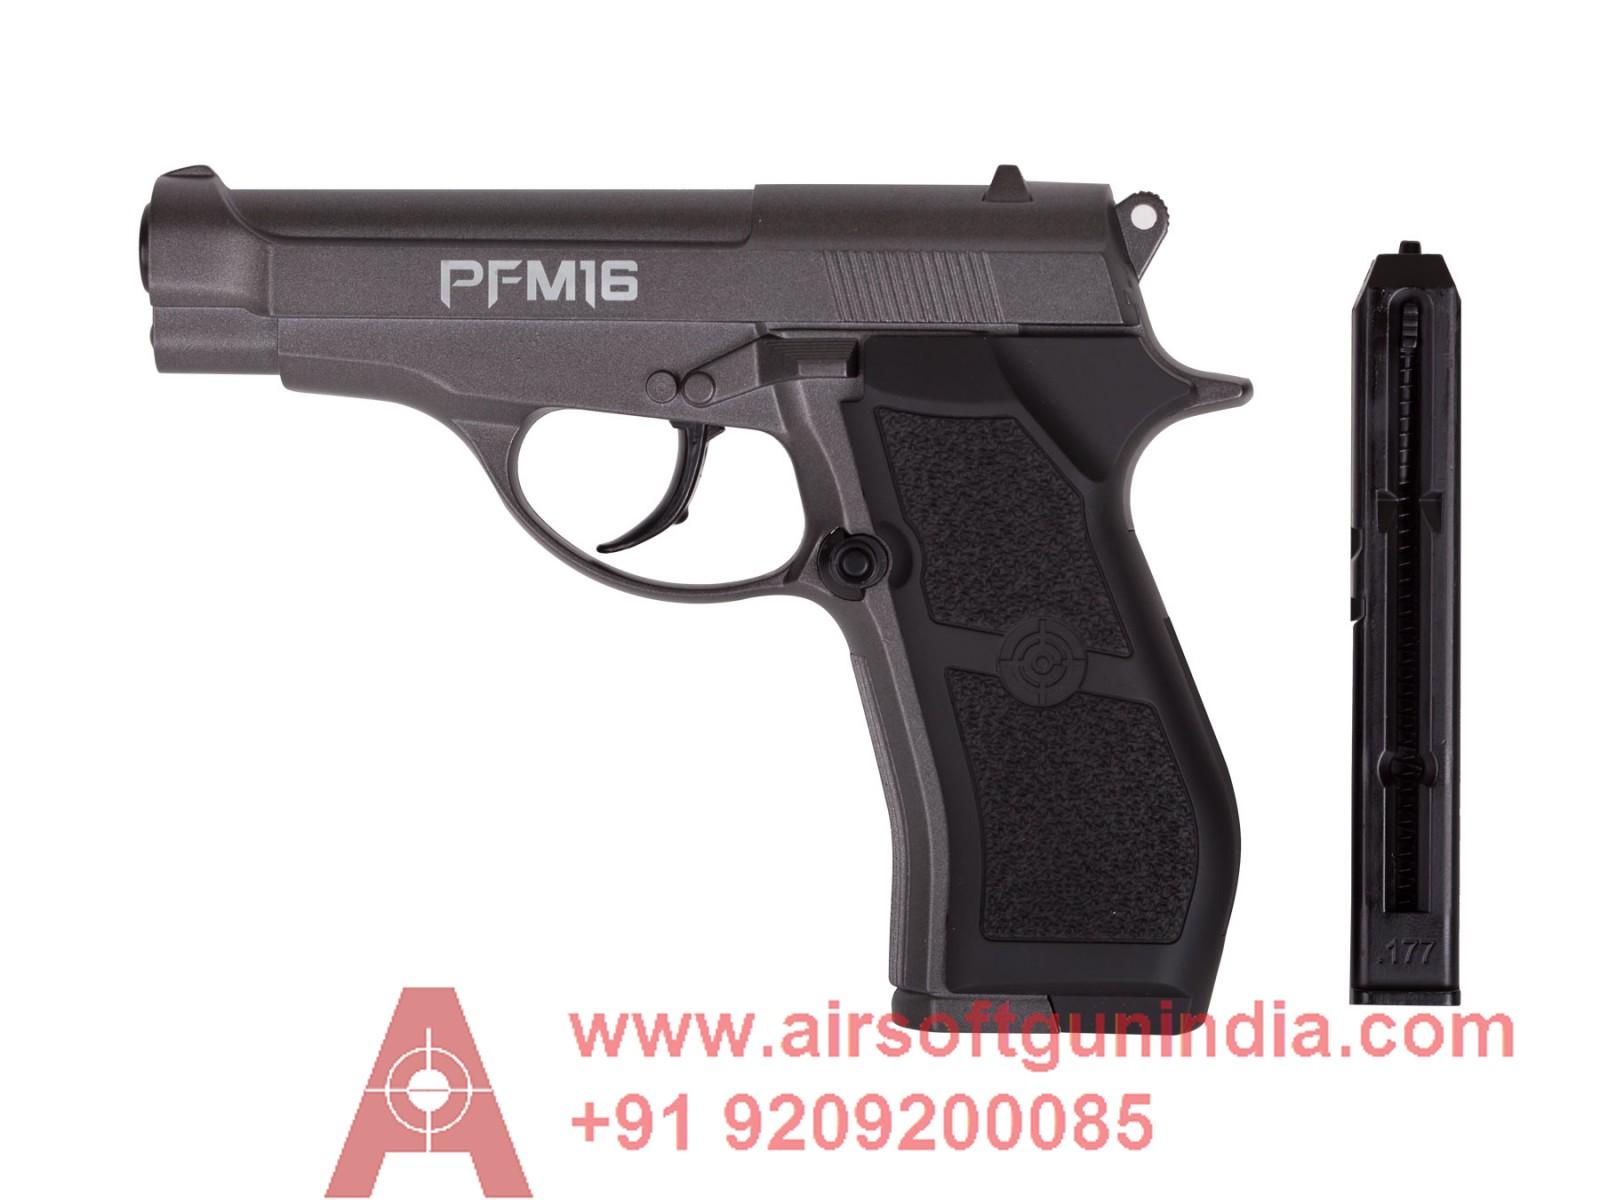 Crosman PFM16 Full Metal CO2 BB Pistol By Airsoft Gun India